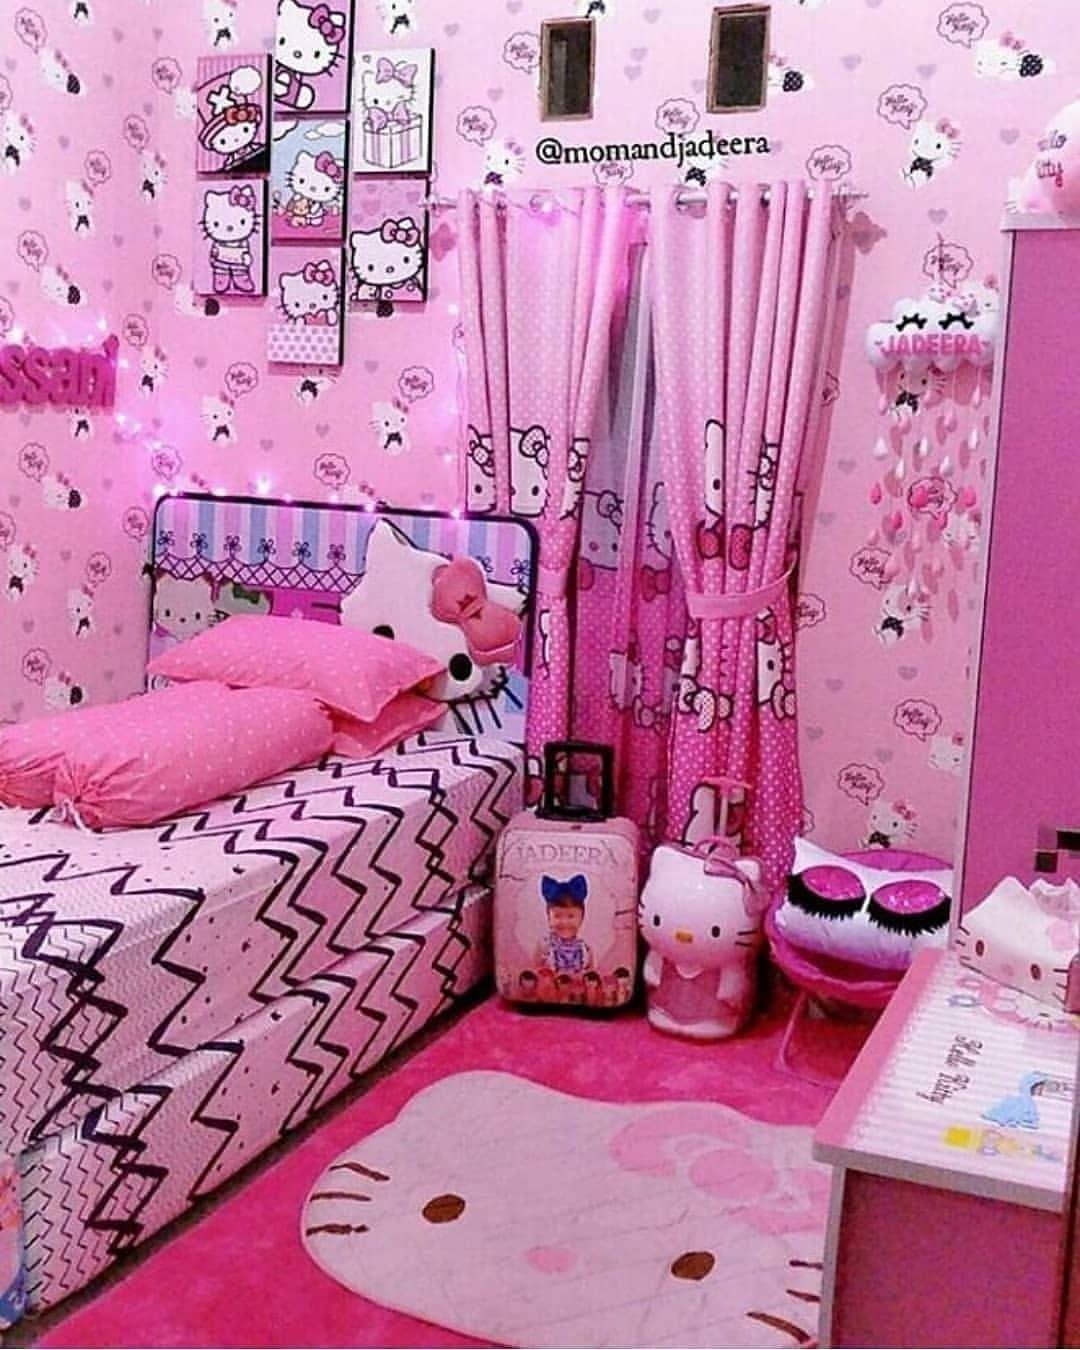 40 Beautiful Bedroom Decorating Ideas Ide Dekorasi Kamar Ide Dekorasi Kamar Tidur Dekorasi Kamar Anak Perempuan